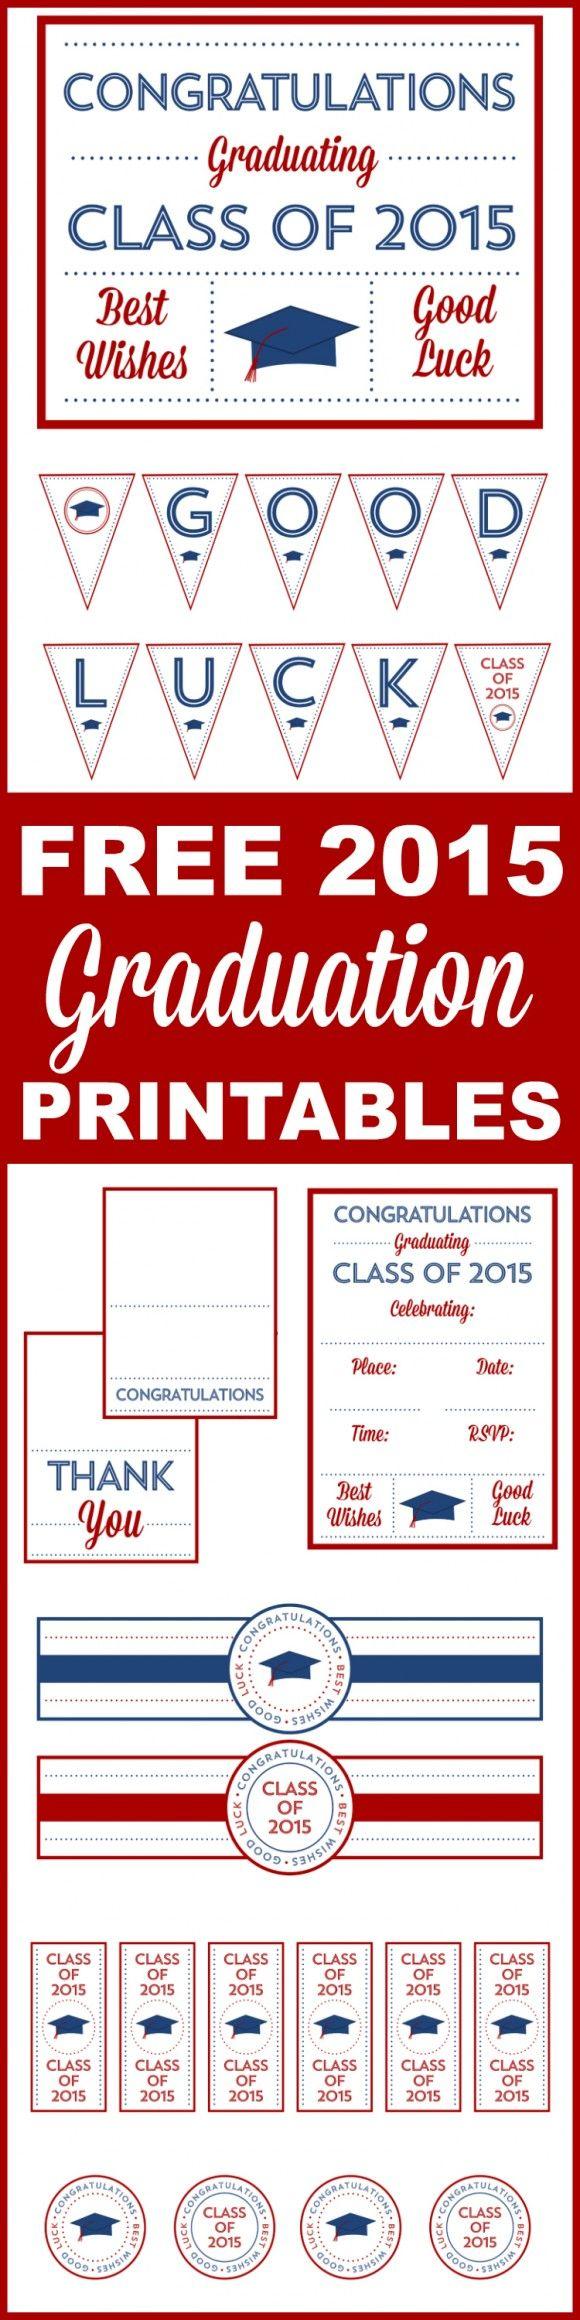 Free 2015 Graduation Printables | CatchMyParty.com